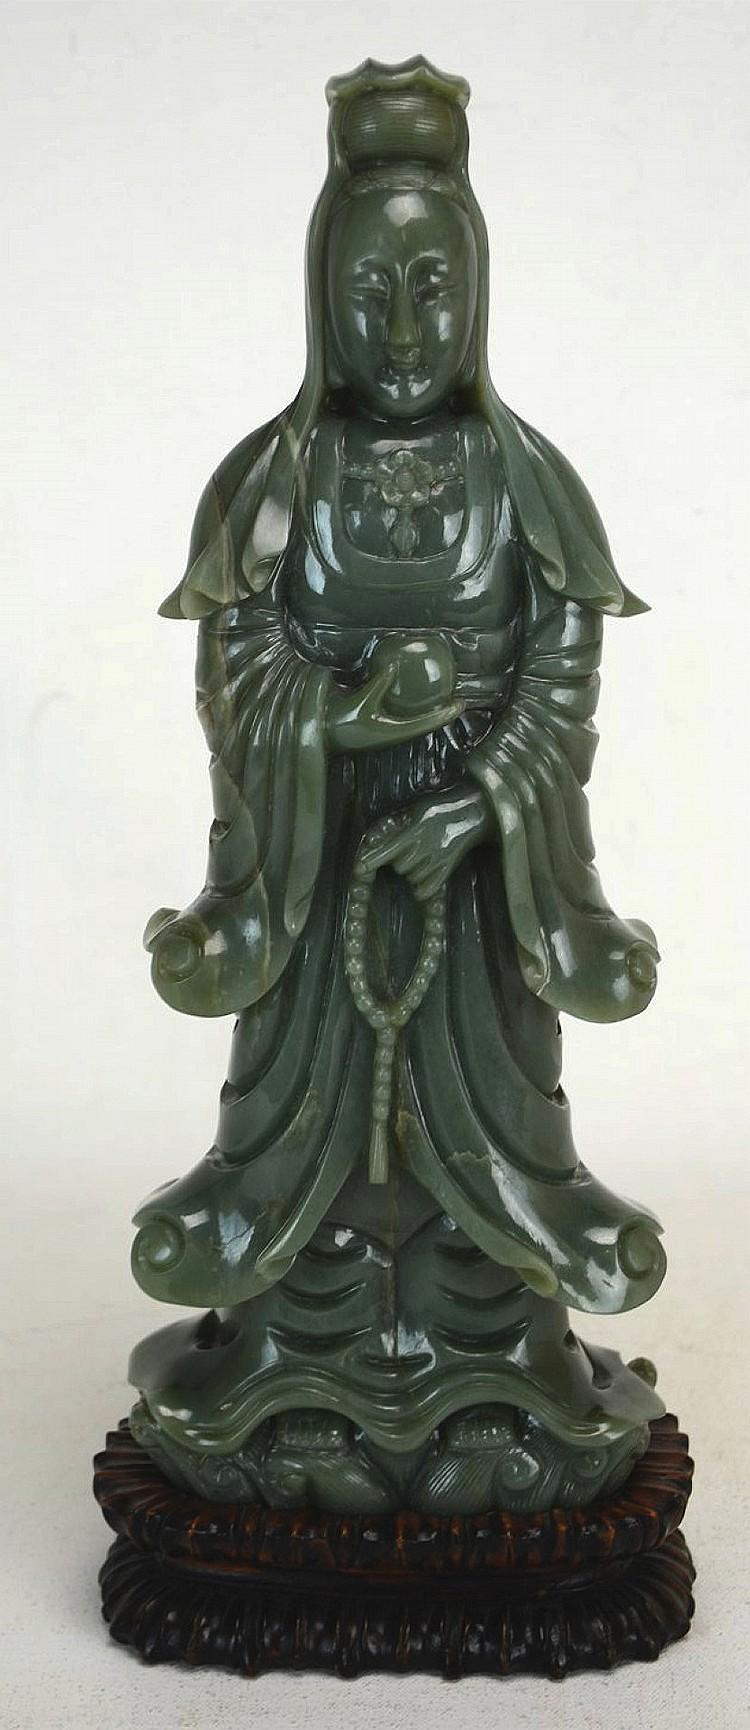 18th C. Chinese Green Jade Carving of Guan Yin